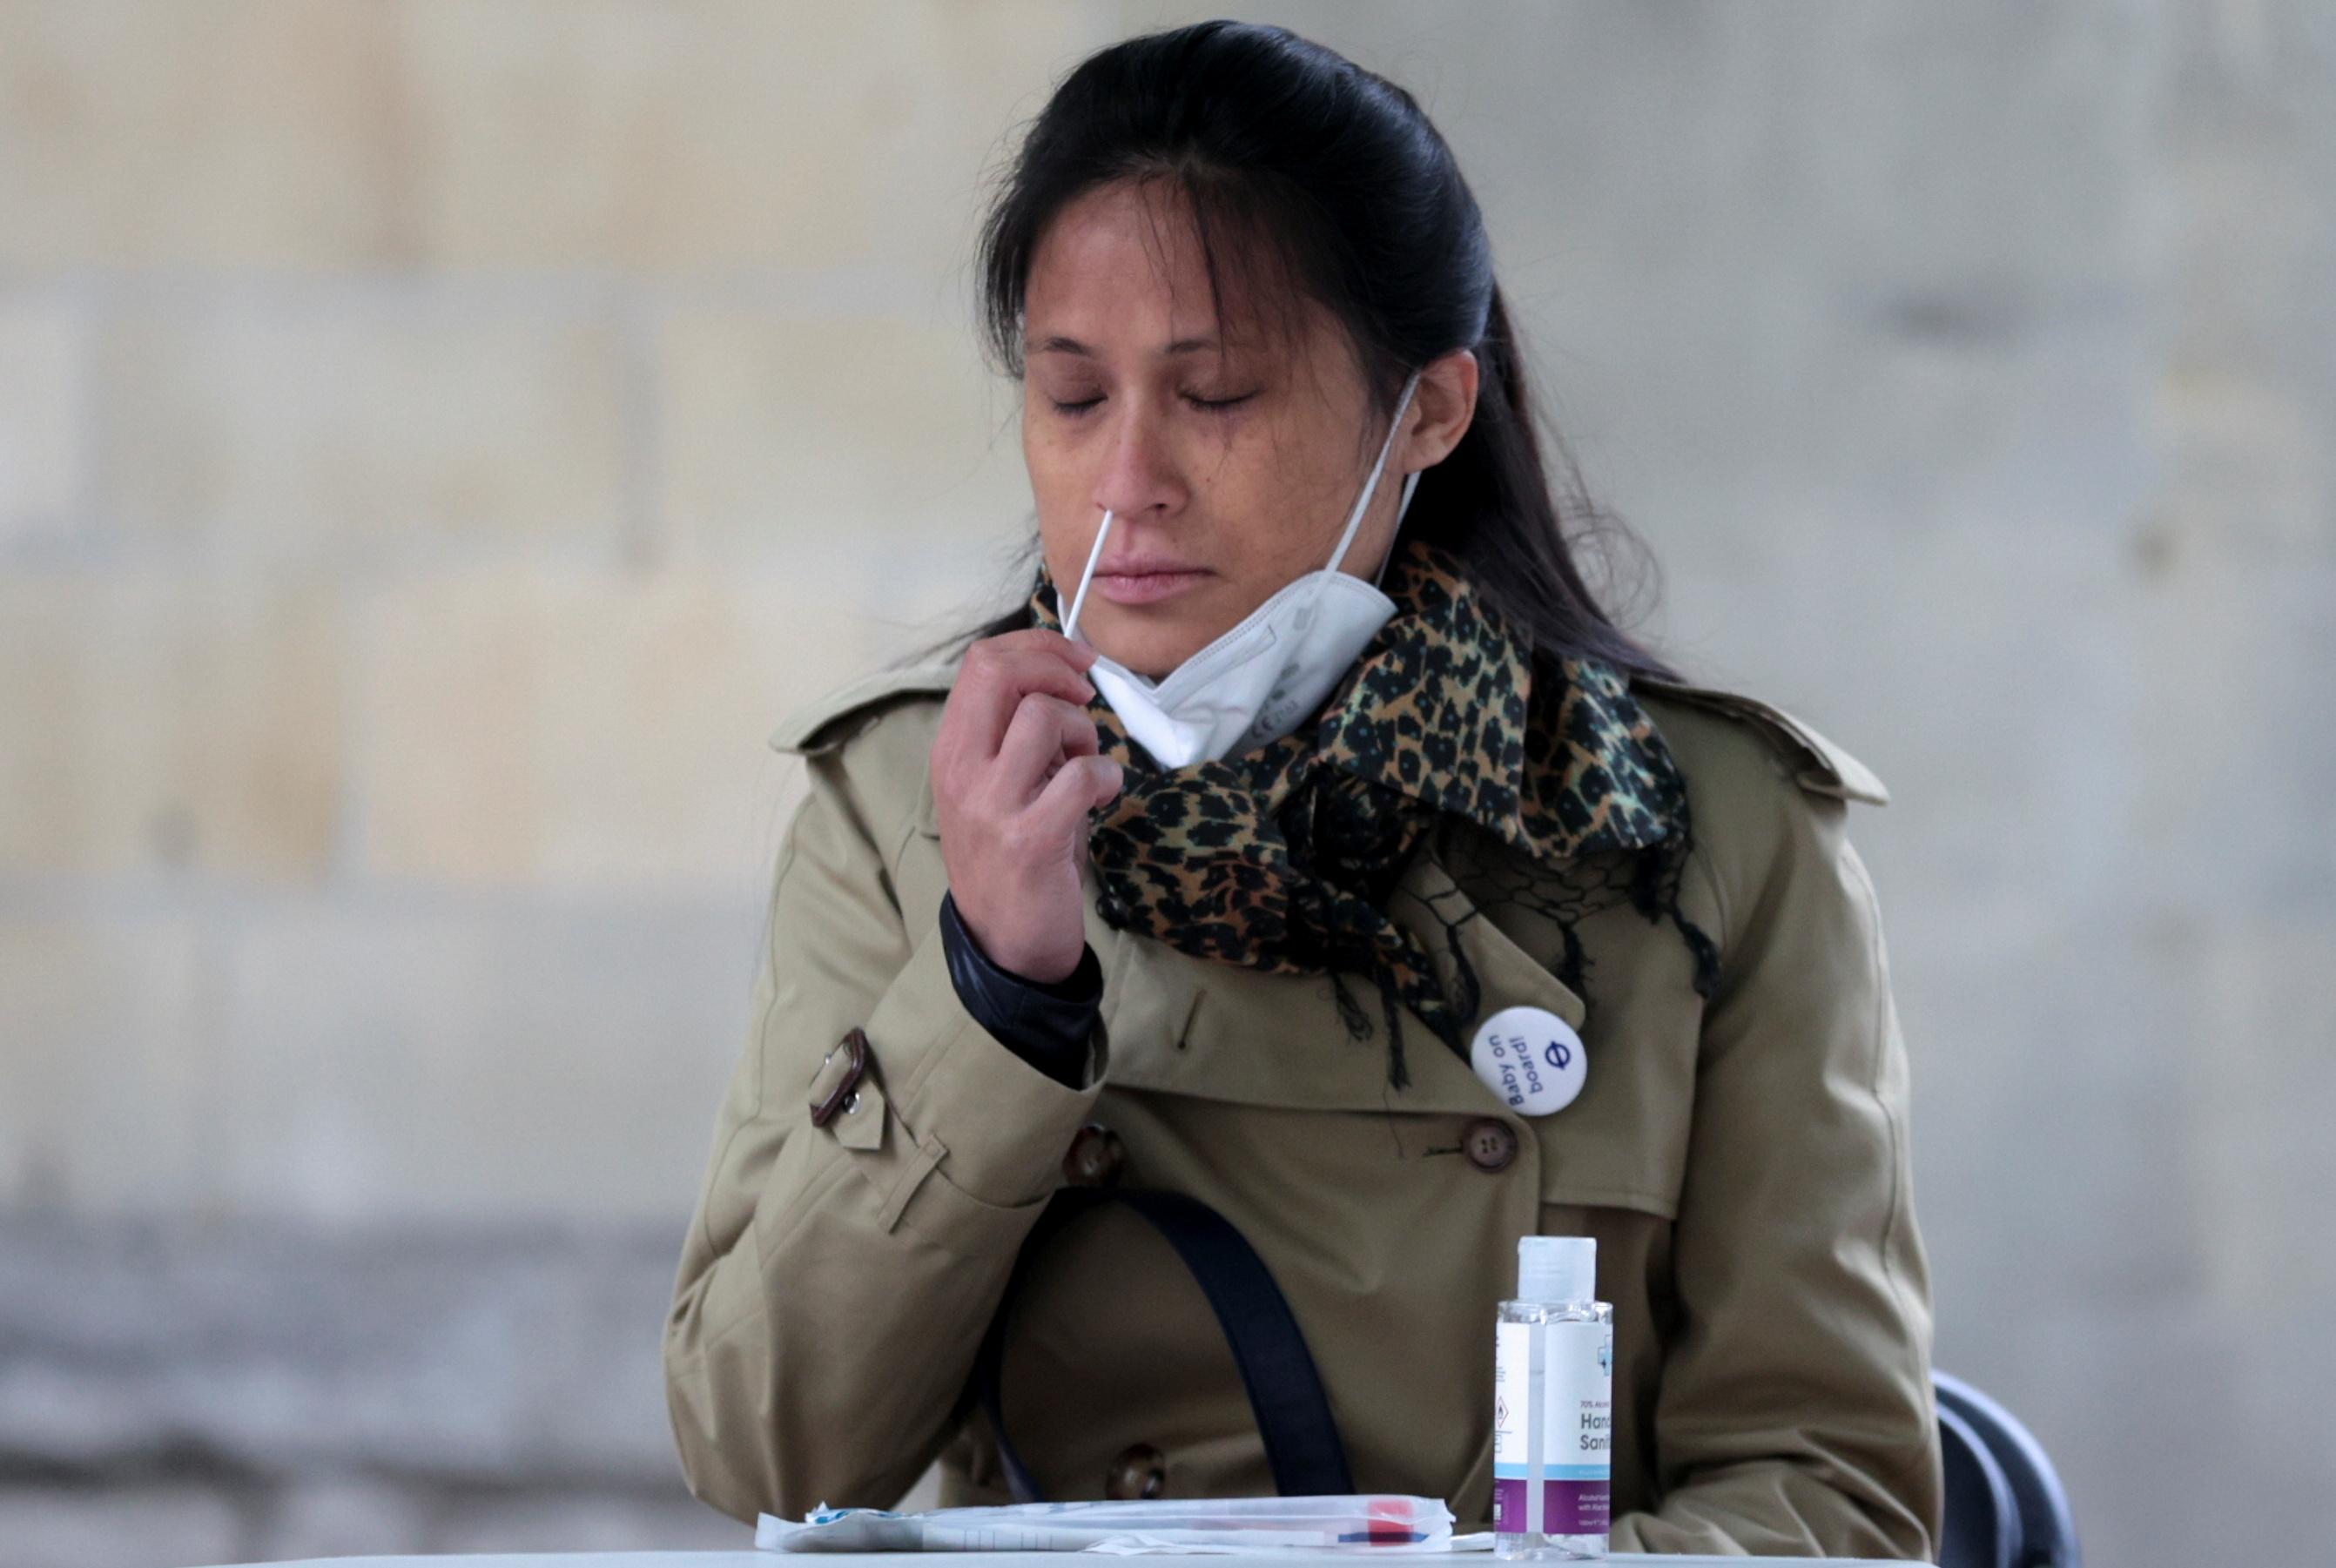 A woman takes a swab sample for the coronavirus disease (COVID-19) at a surge testing site in London, Britain, May 14, 2021. REUTERS/Hannah McKay